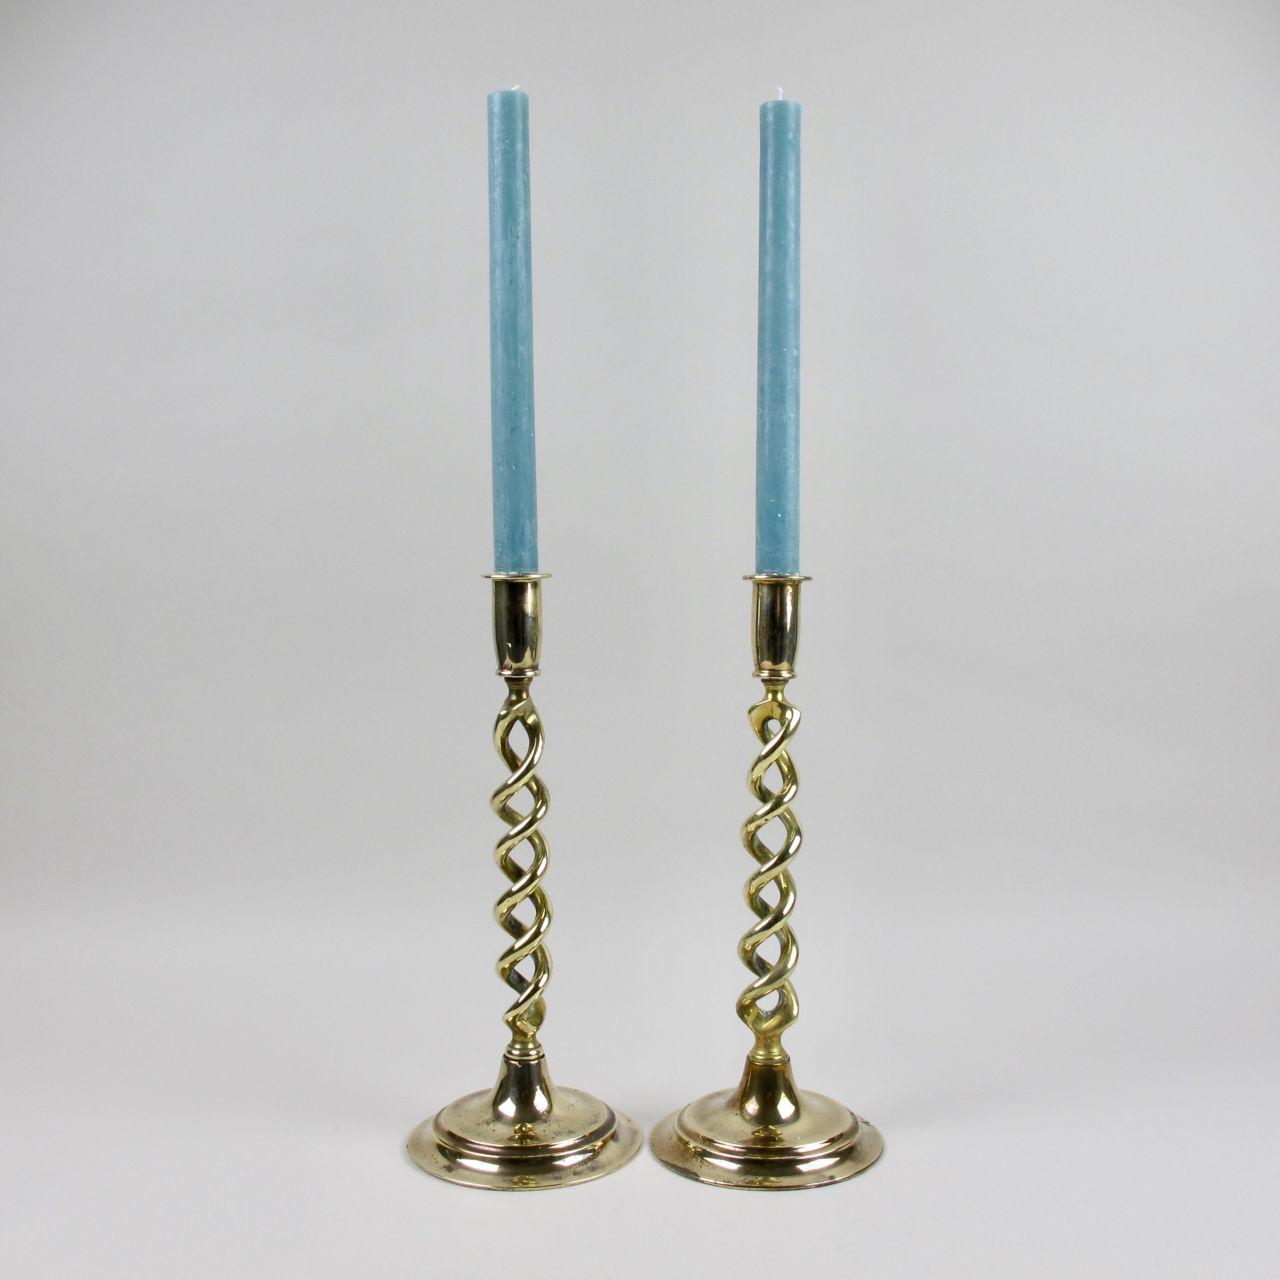 Pair of Tall Brass Twist Stem Candlesticks